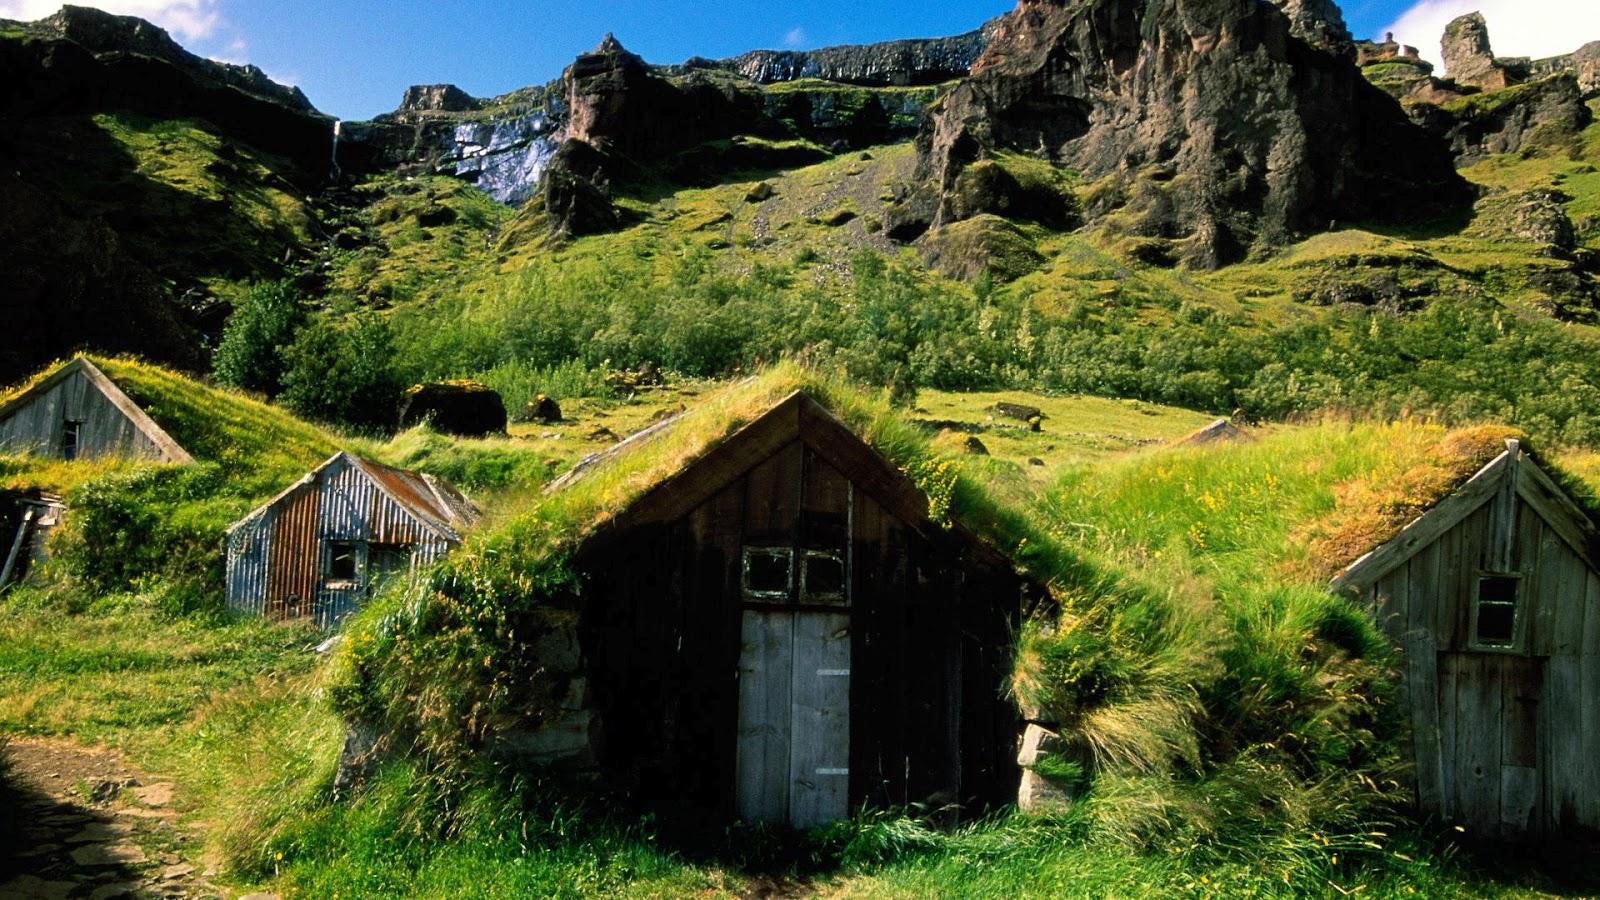 http://1.bp.blogspot.com/-WL7EaydEDQs/UFrH1VOBvdI/AAAAAAAAAGI/9tw6ApfPyk4/s1600/Houses_in_Iceland_wallpapers.jpg